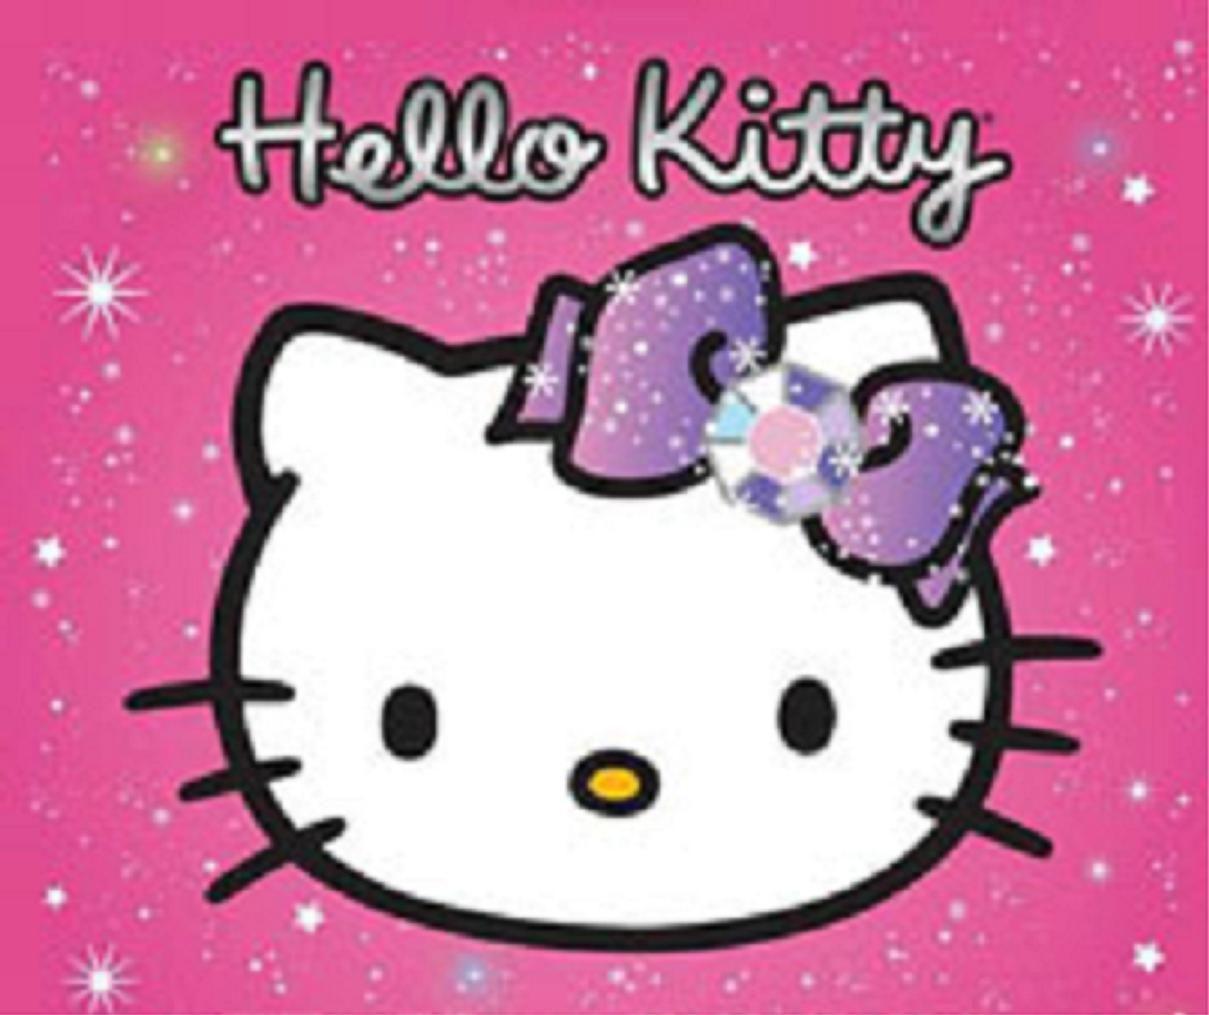 17 Images About Hello Kitty On Pinterest Sanrio Hello Kitty